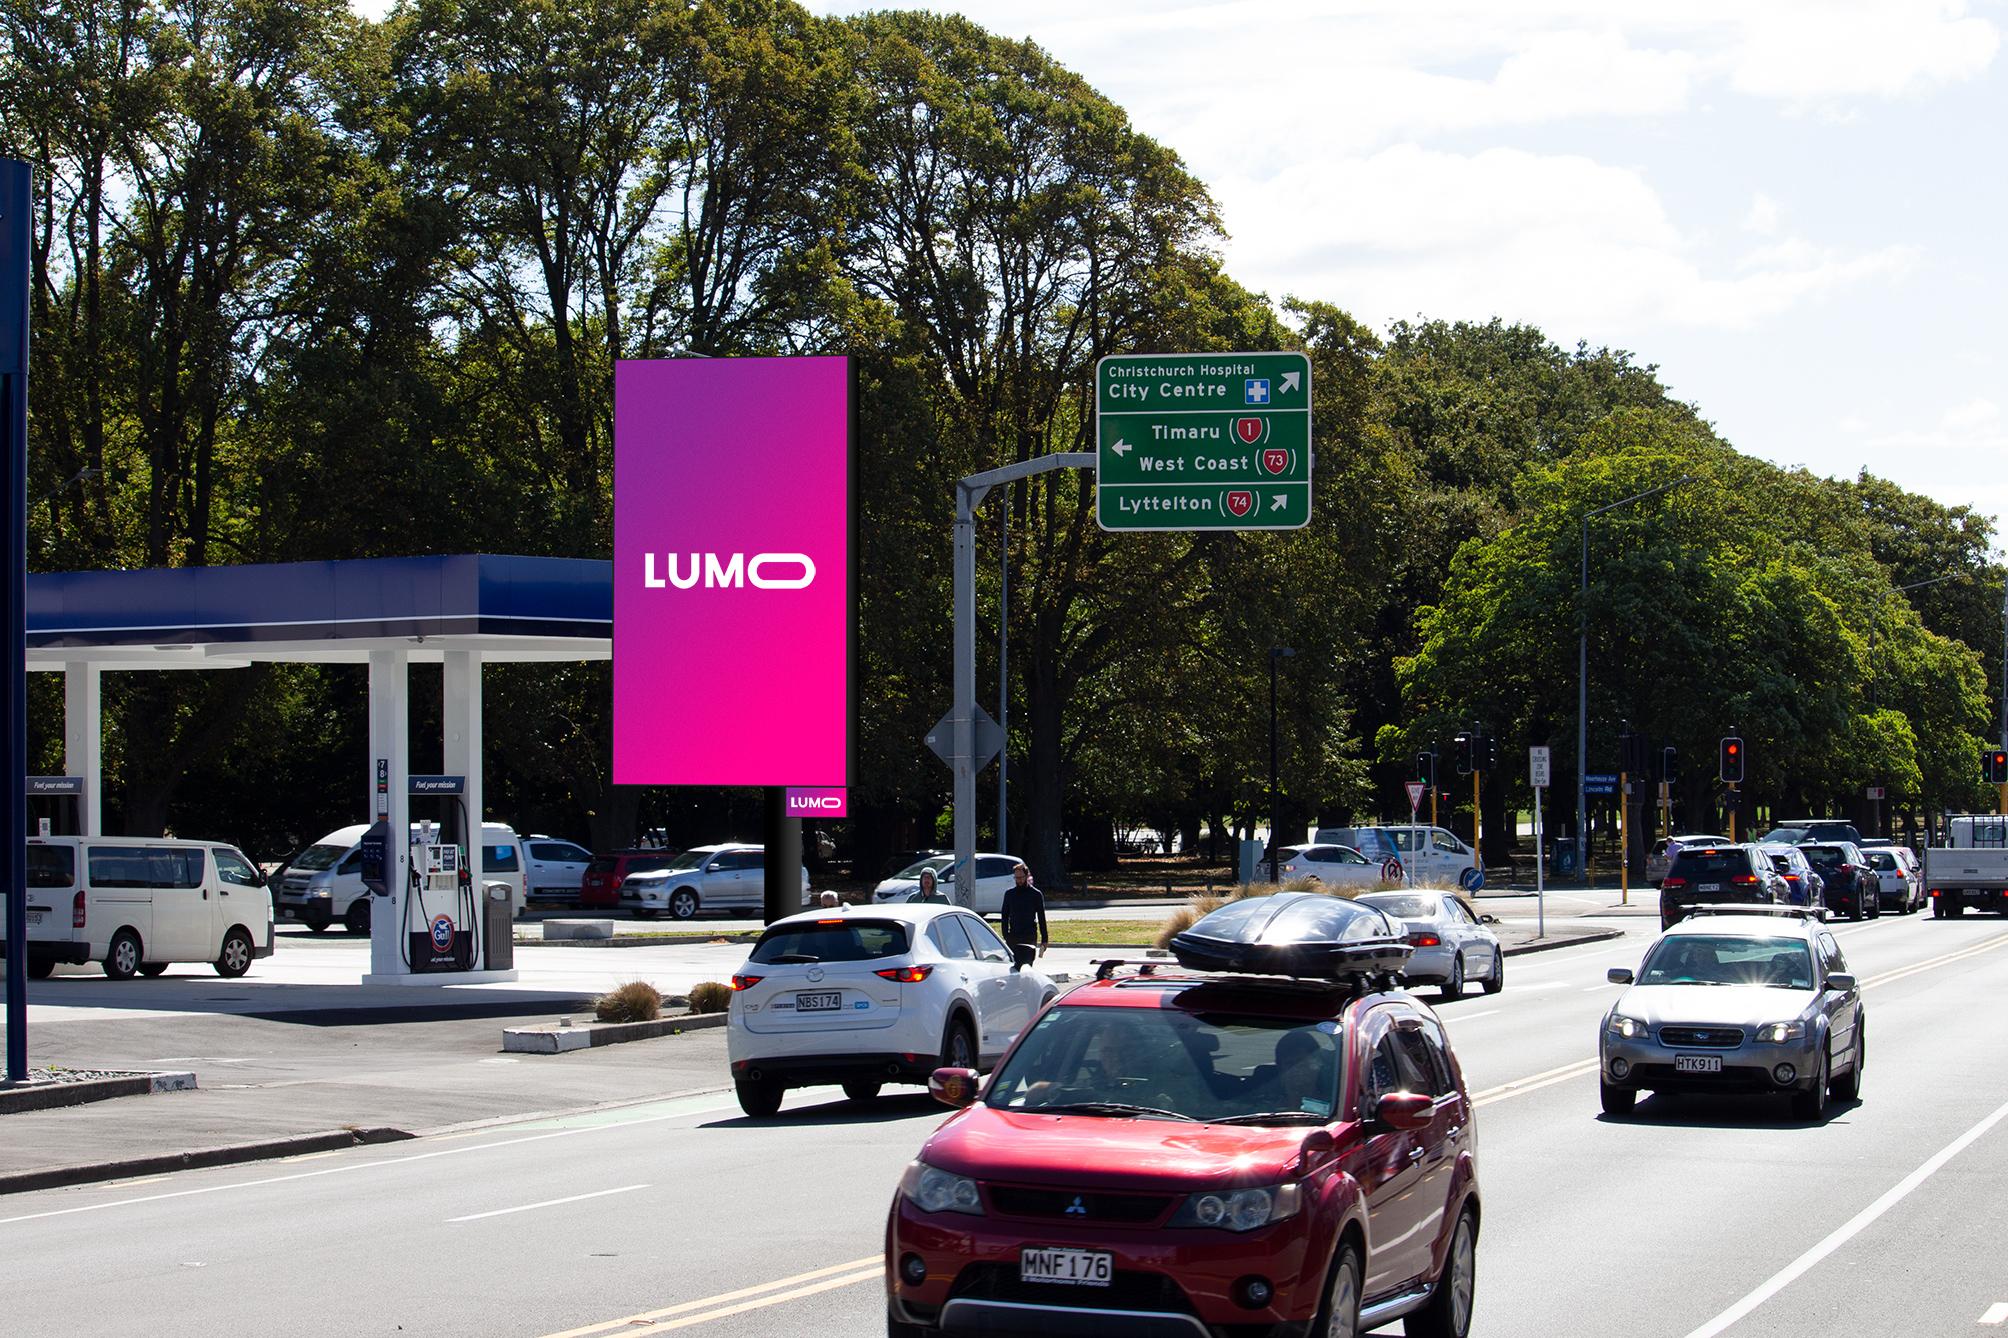 LUMO-Lincoln IN